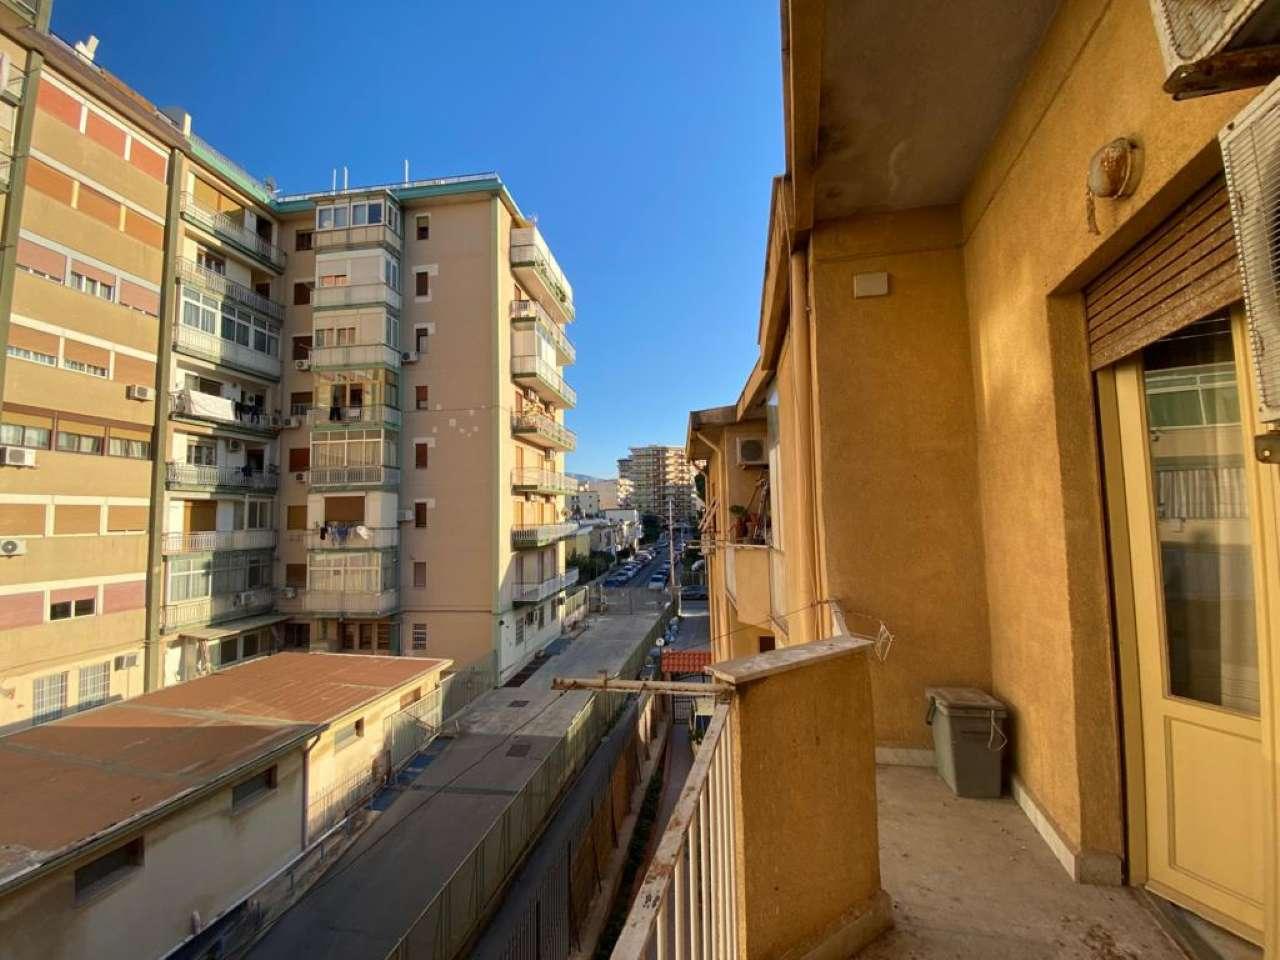 Quadrilocale, Via Angelo Callimaco, Quartiere Noce, Palermo, foto 11